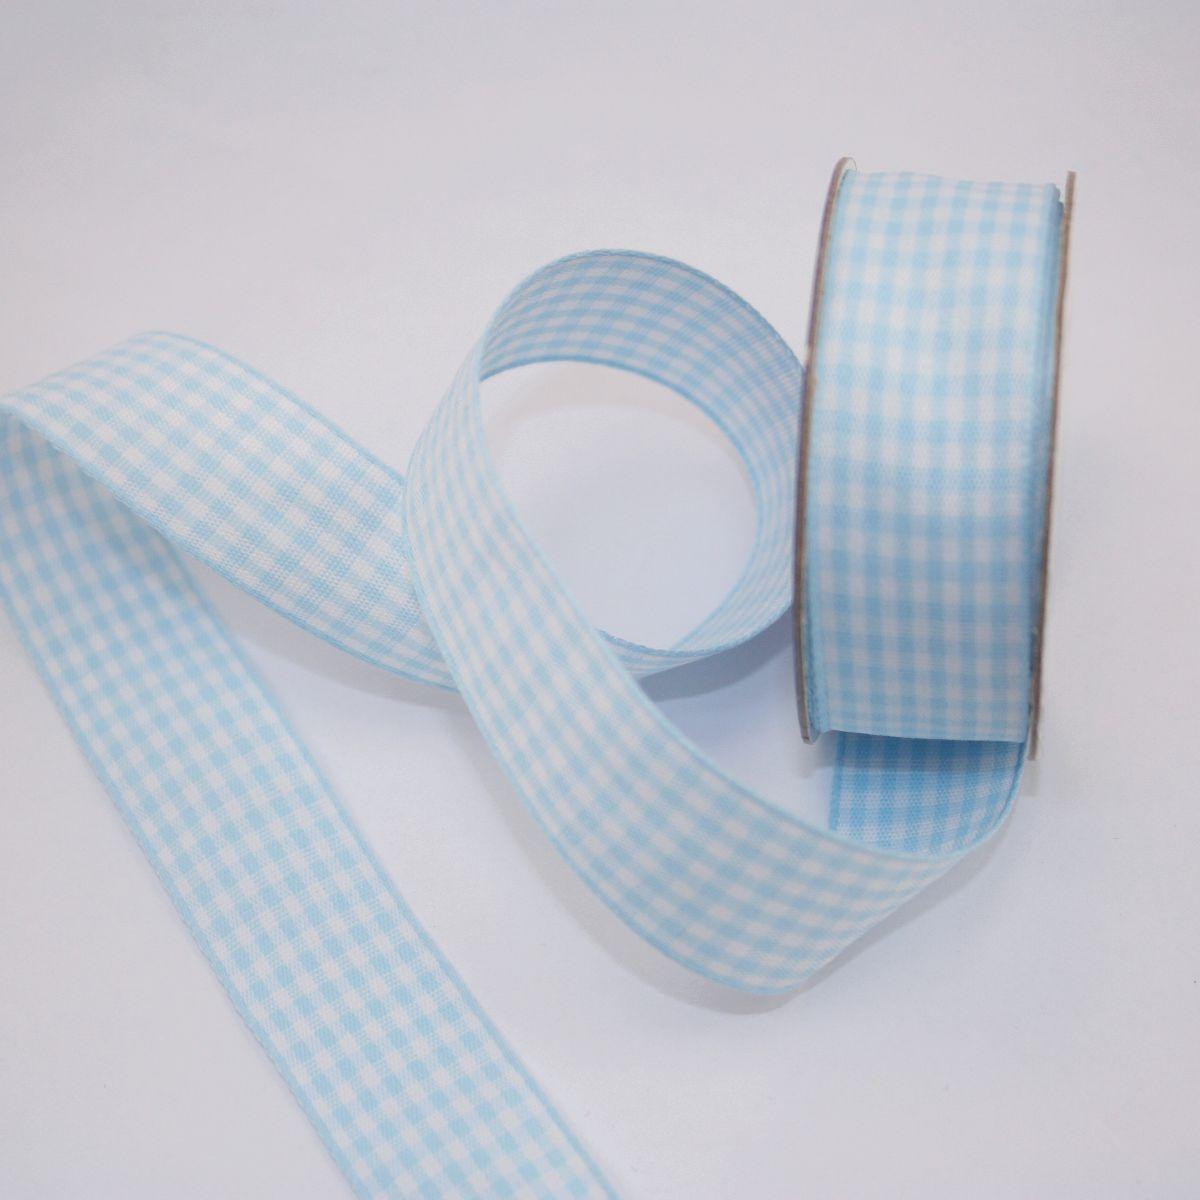 Ruban vichy en bobine bleu ciel 20 mm